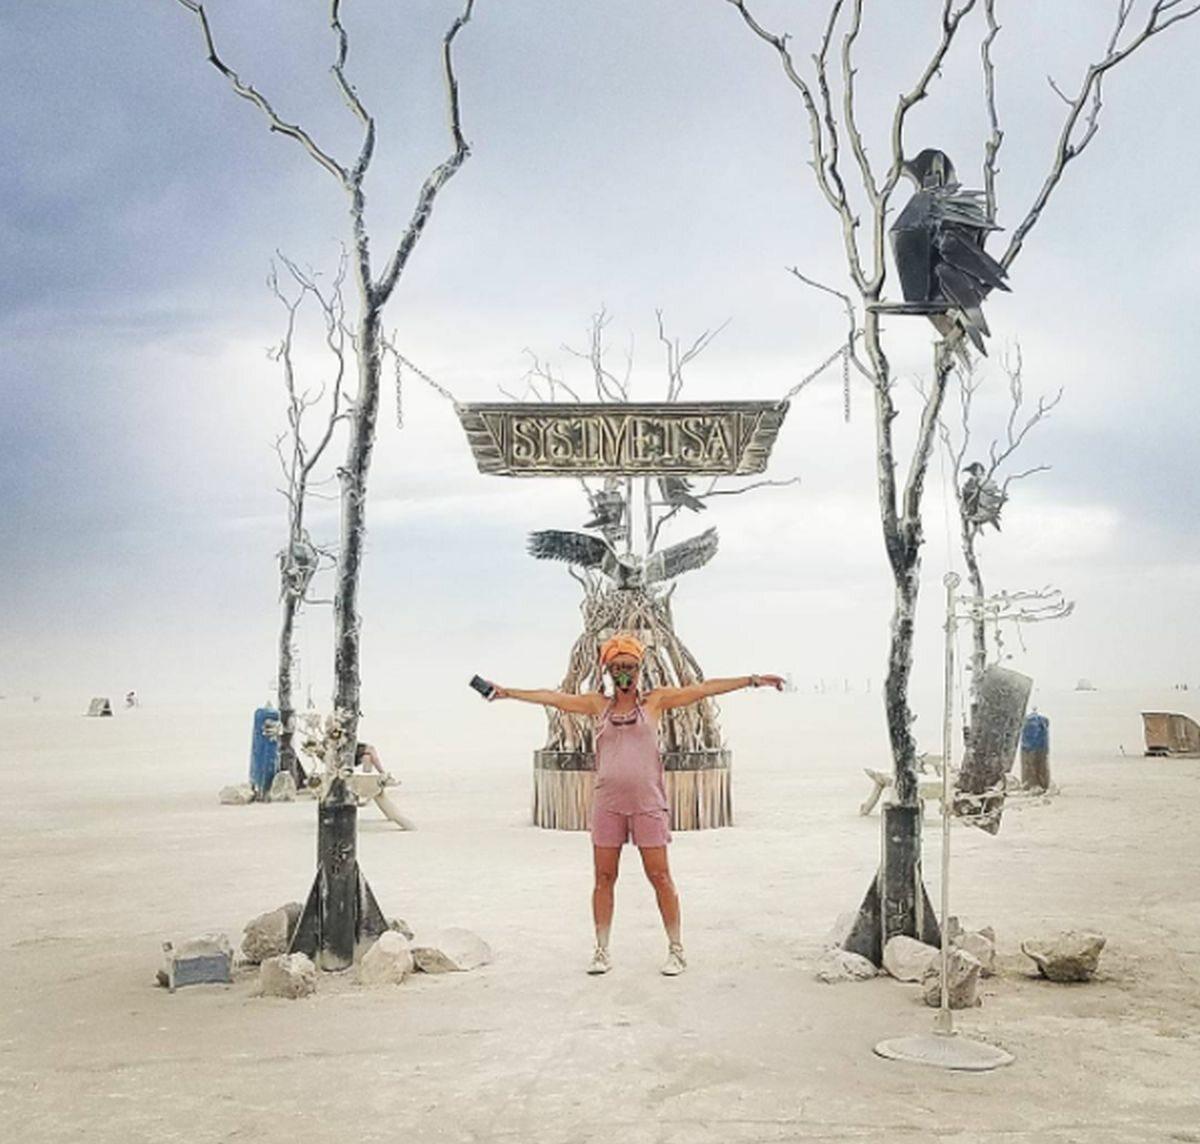 Instalacja na Burning Man 2017